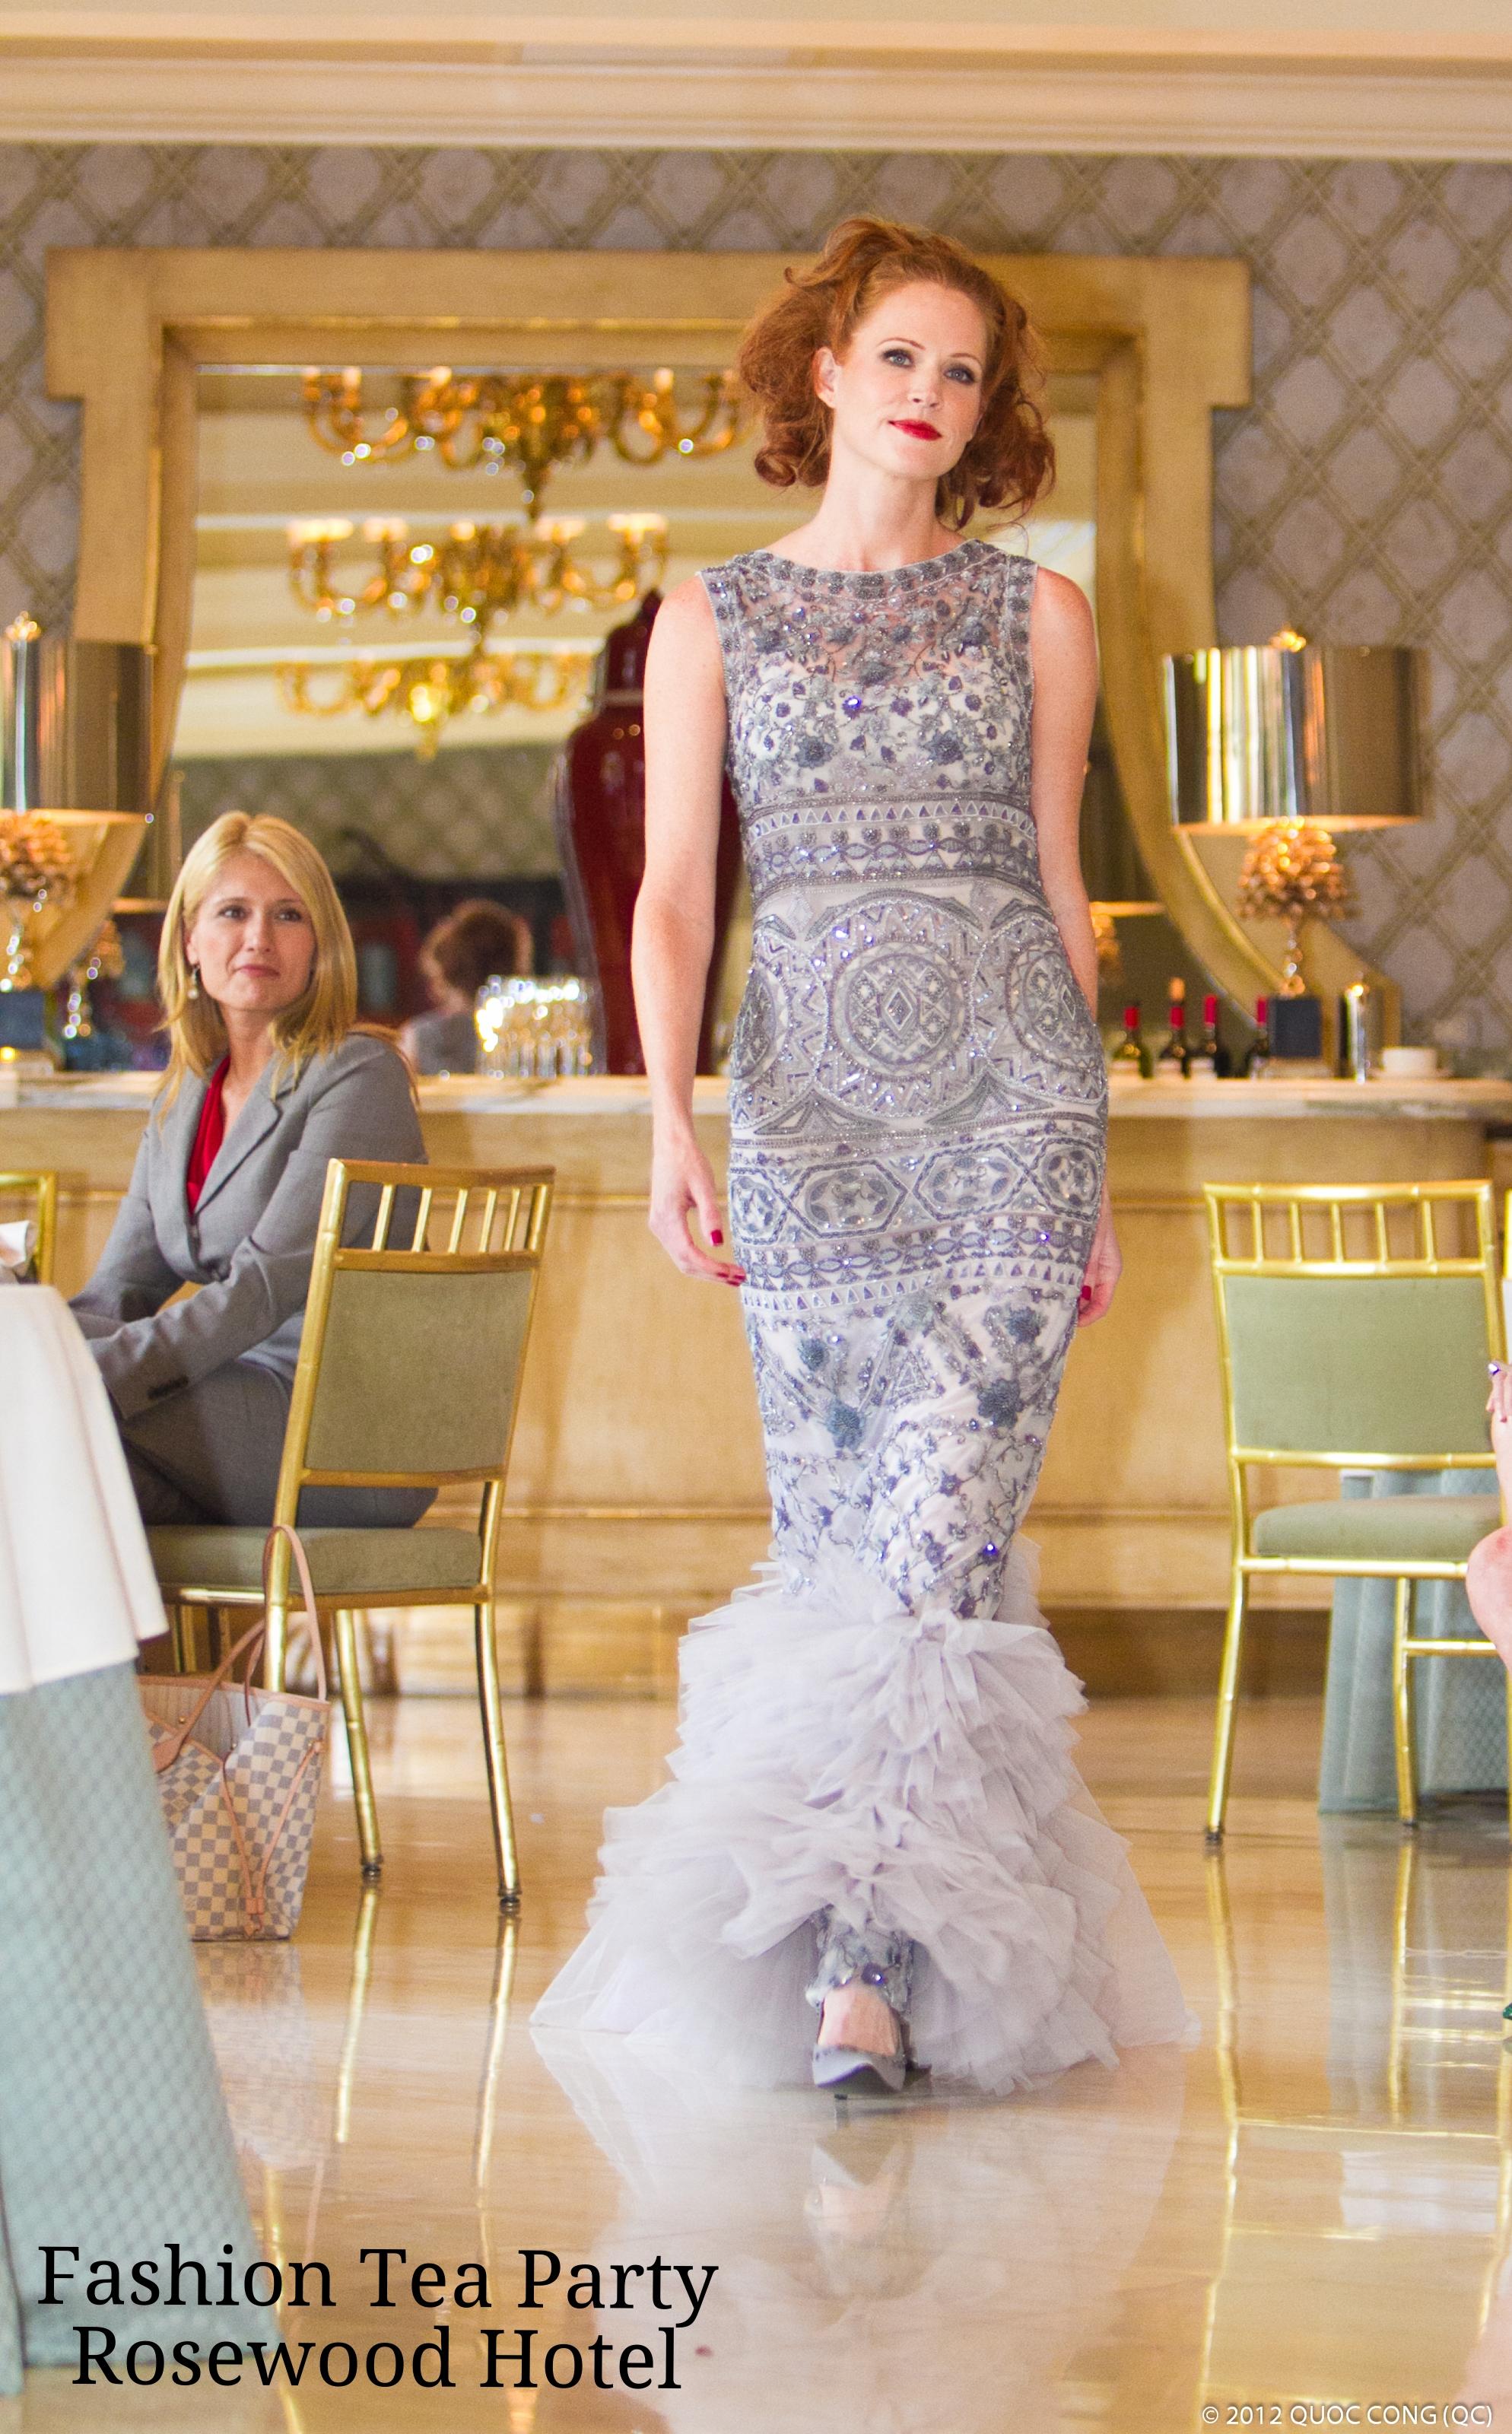 RosewoodHotel_FashionTeaParty2.JPG